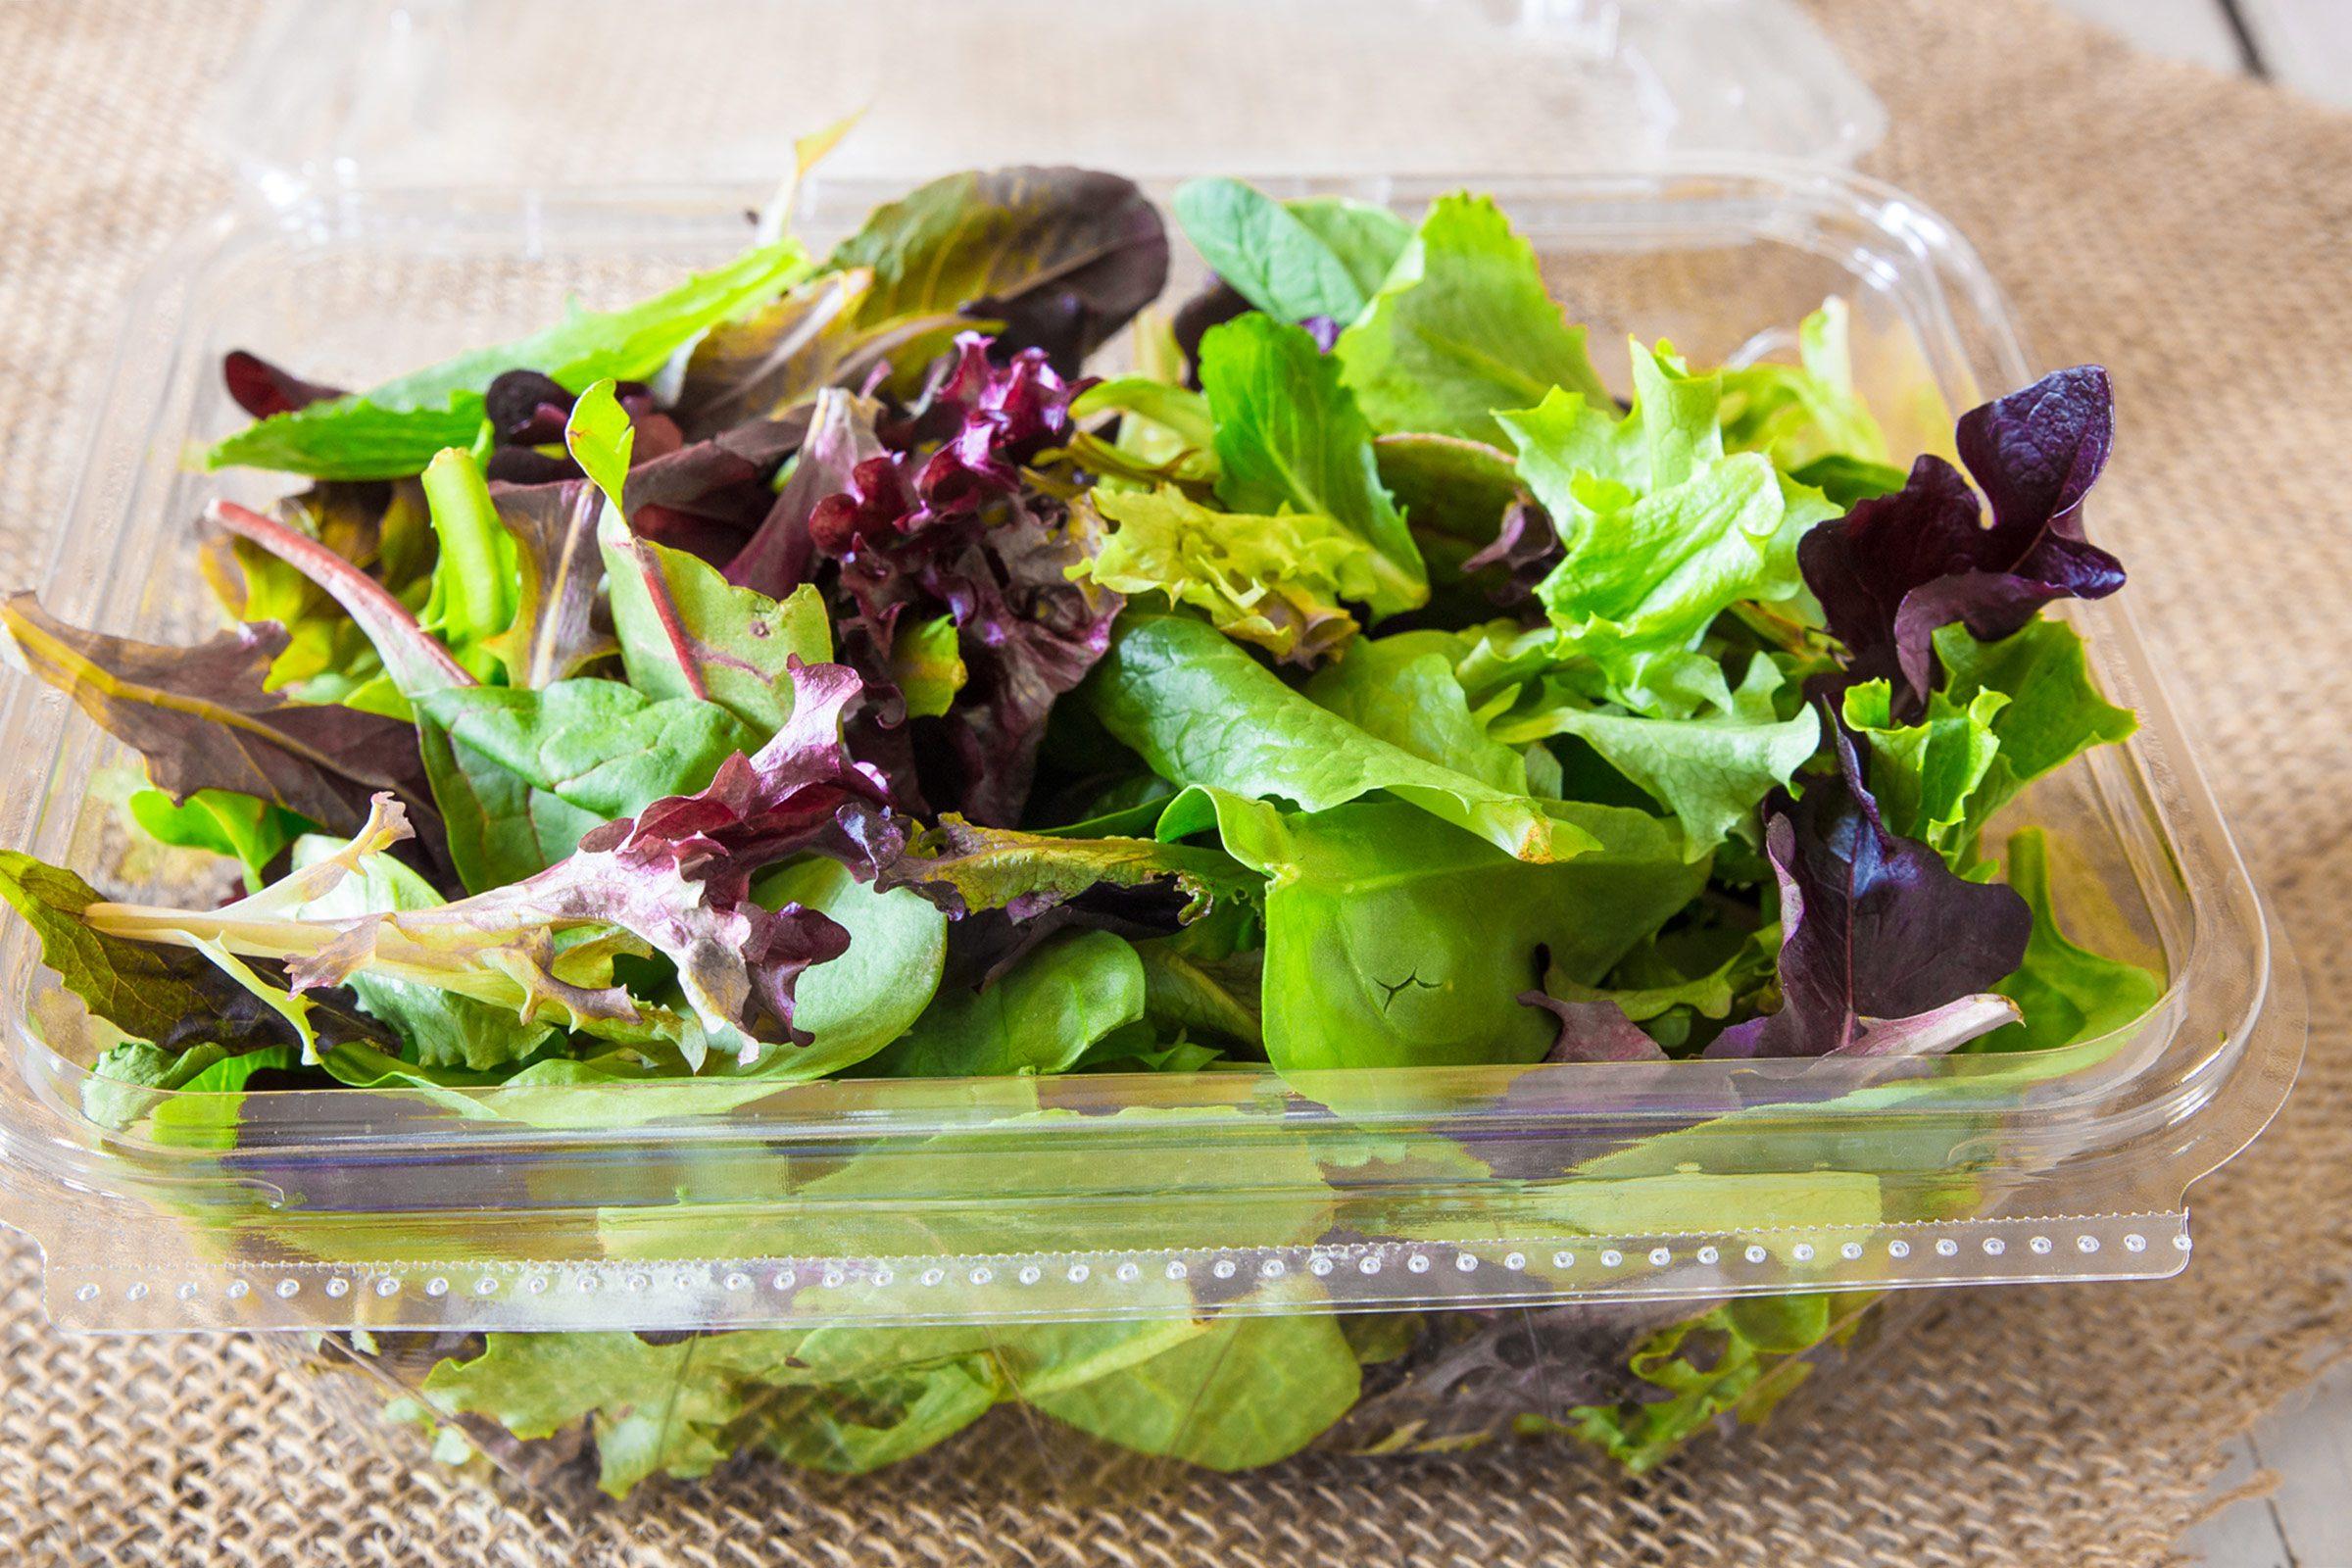 3. Keep produce fresh longer